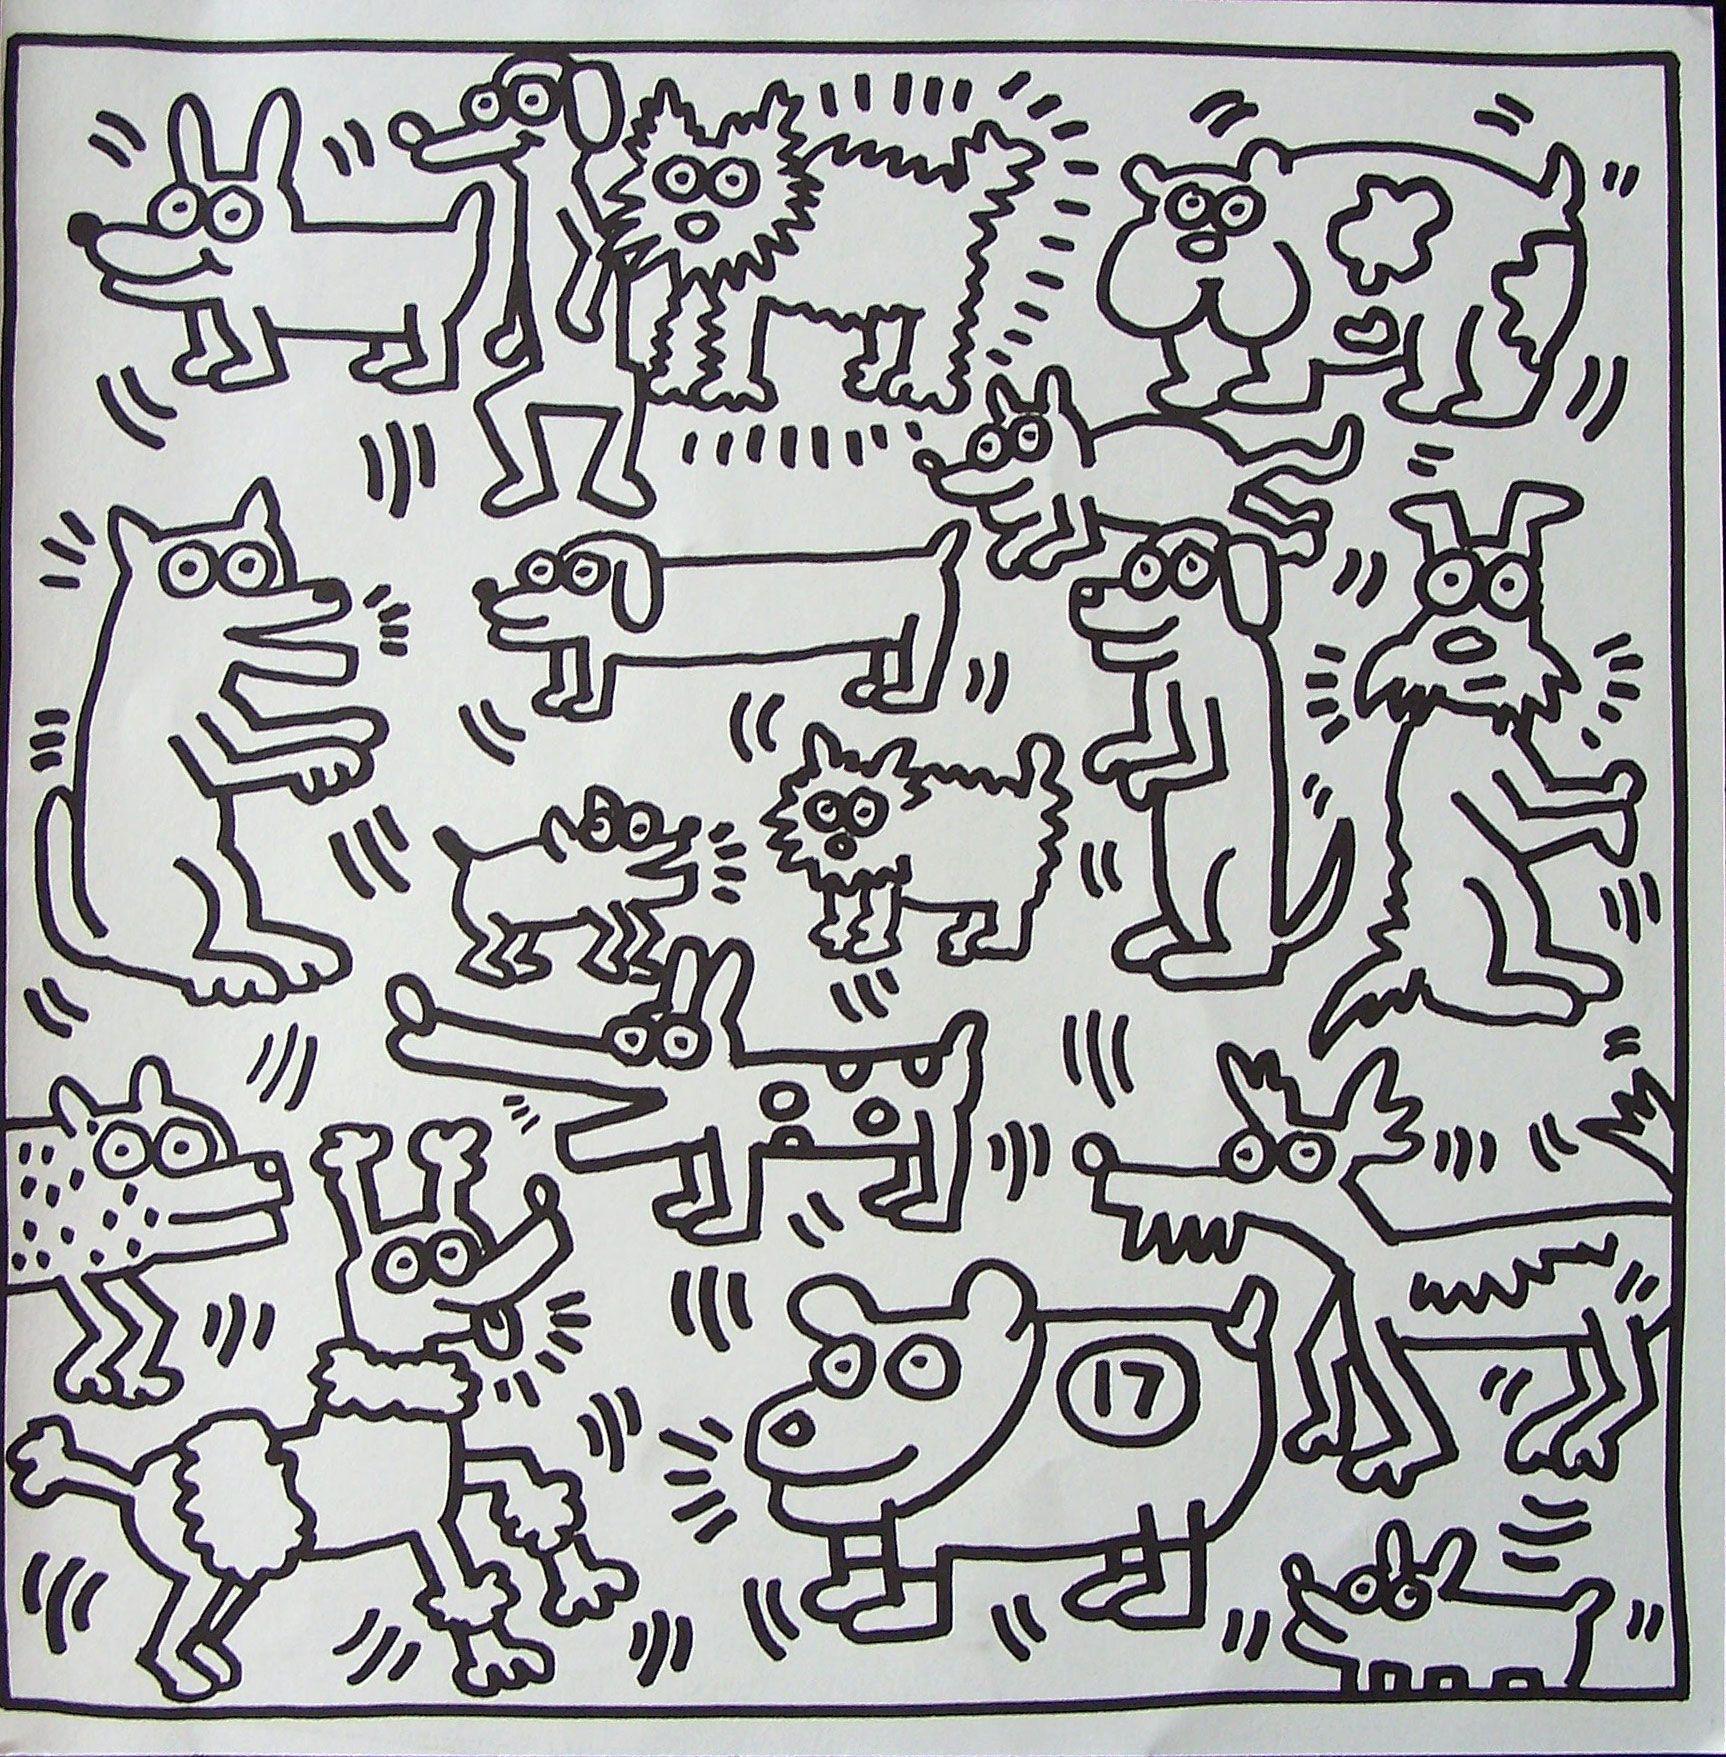 Honden Keith Haring Keith Haring Keith Doodle Ideeen